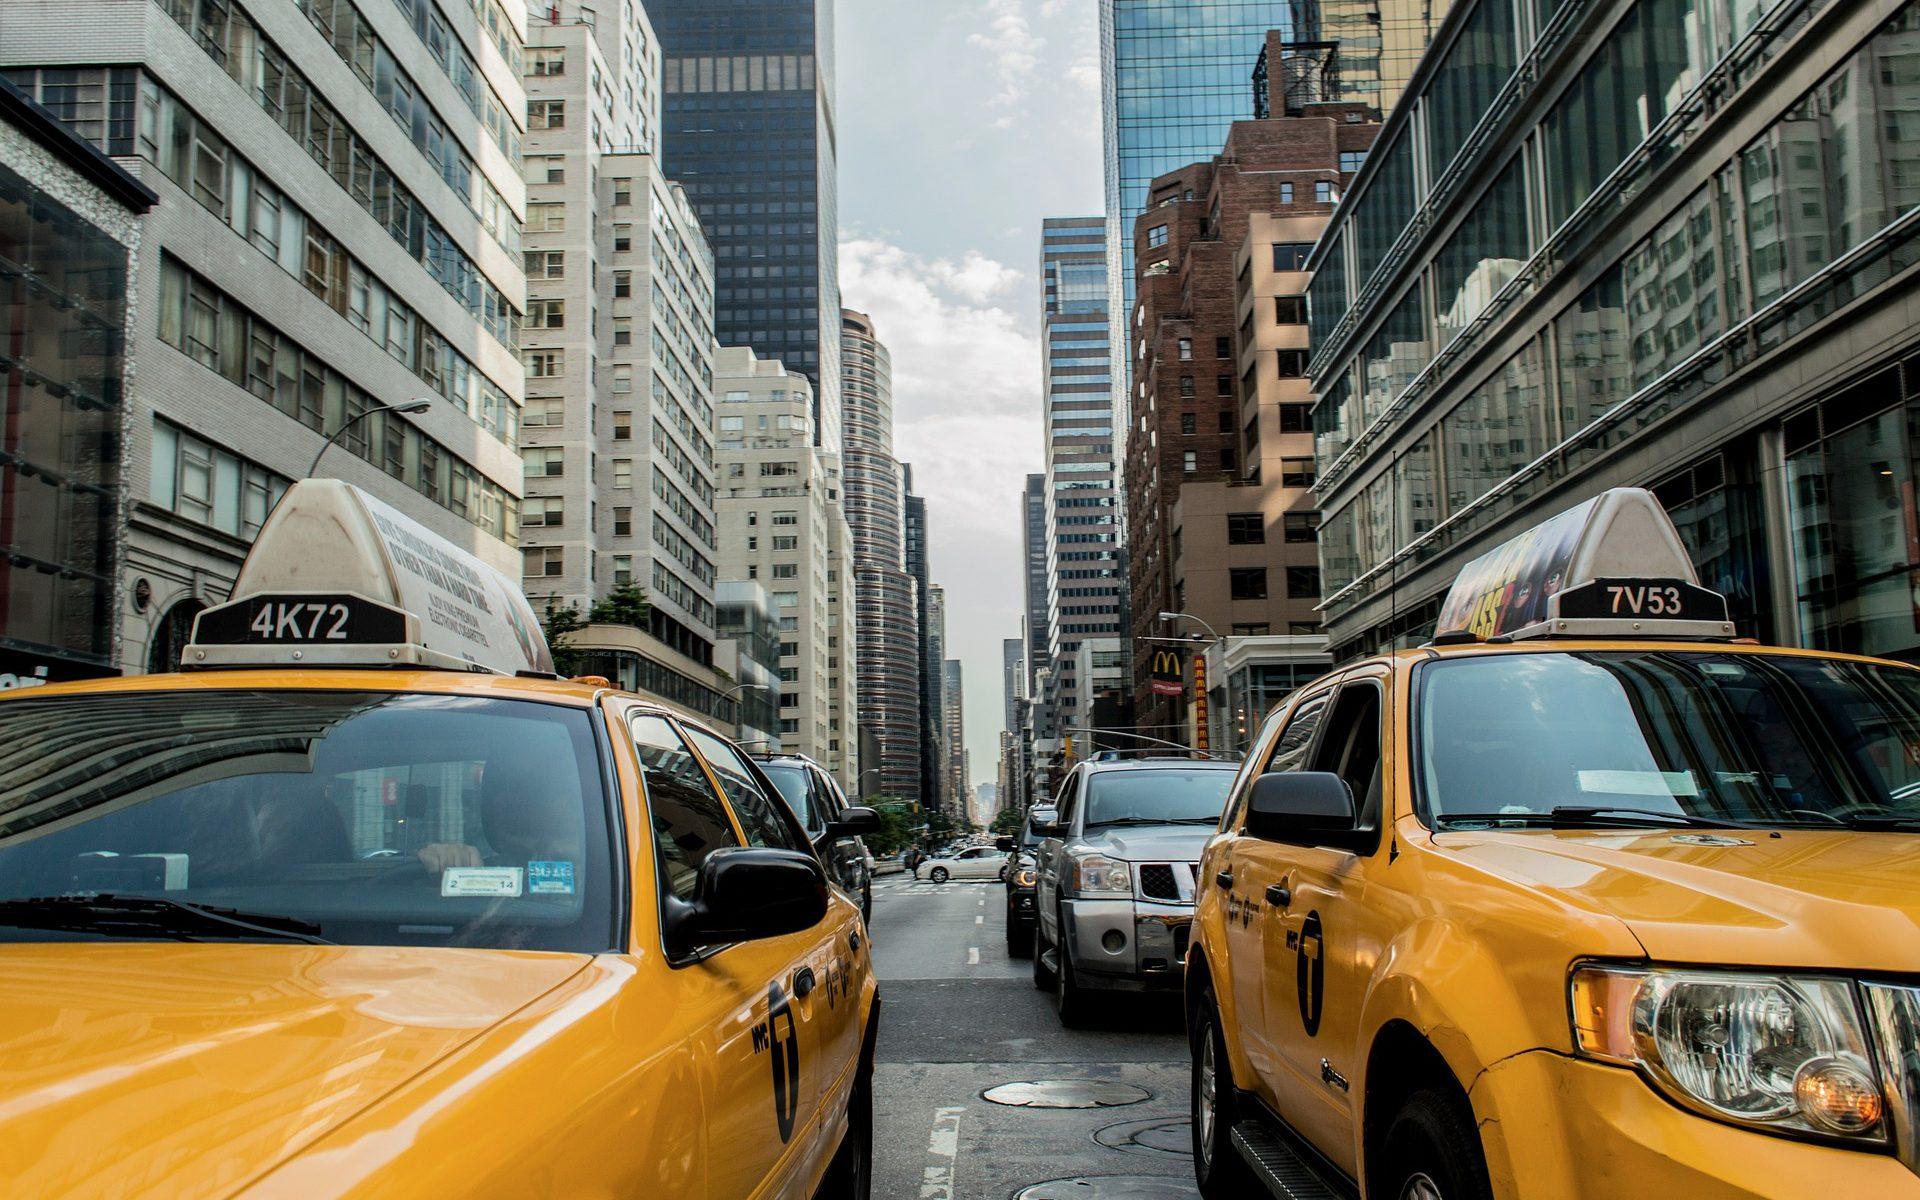 Hittegods taxi